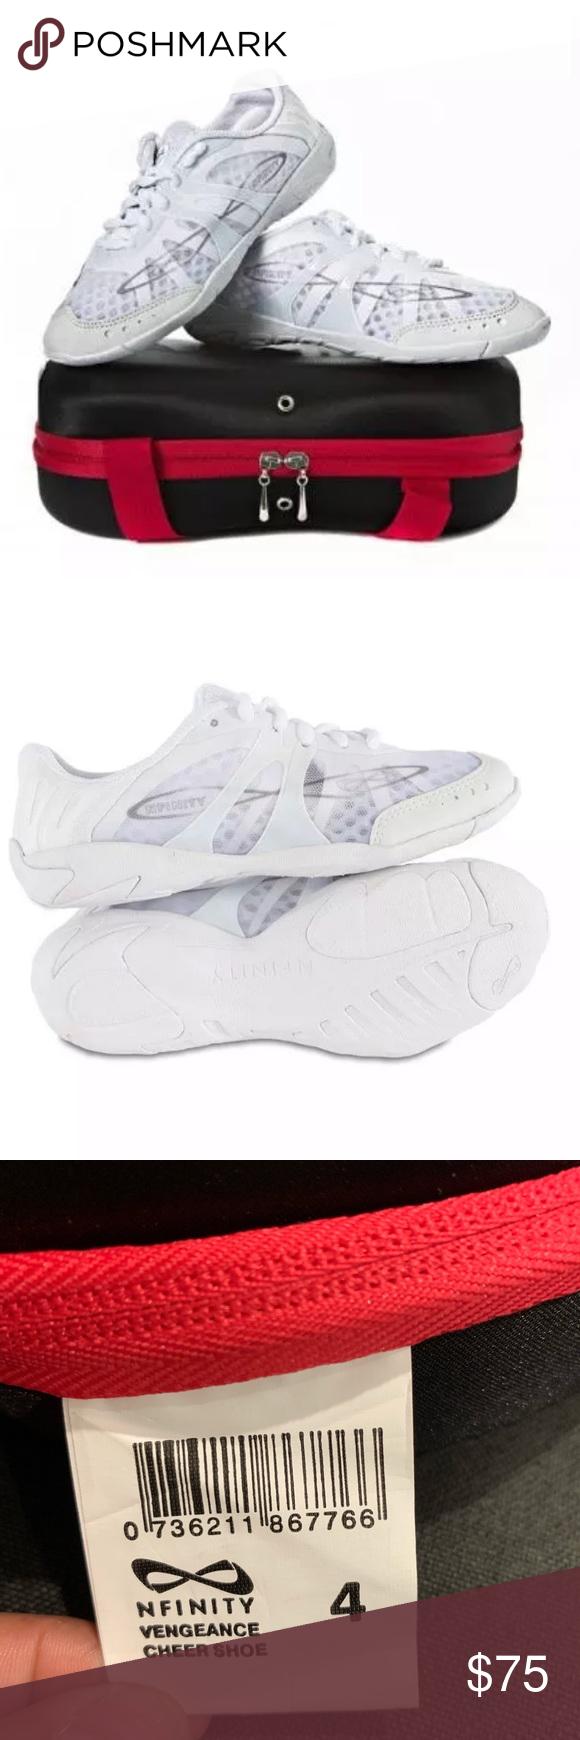 Nfinity Vengeance Youth Cheer Shoe Size 4 Girls Size 4 Cheer Shoes Brand New Nfinity Shoes Athletic Shoes Youth Cheer Shoes Cheer Shoes Youth Cheer